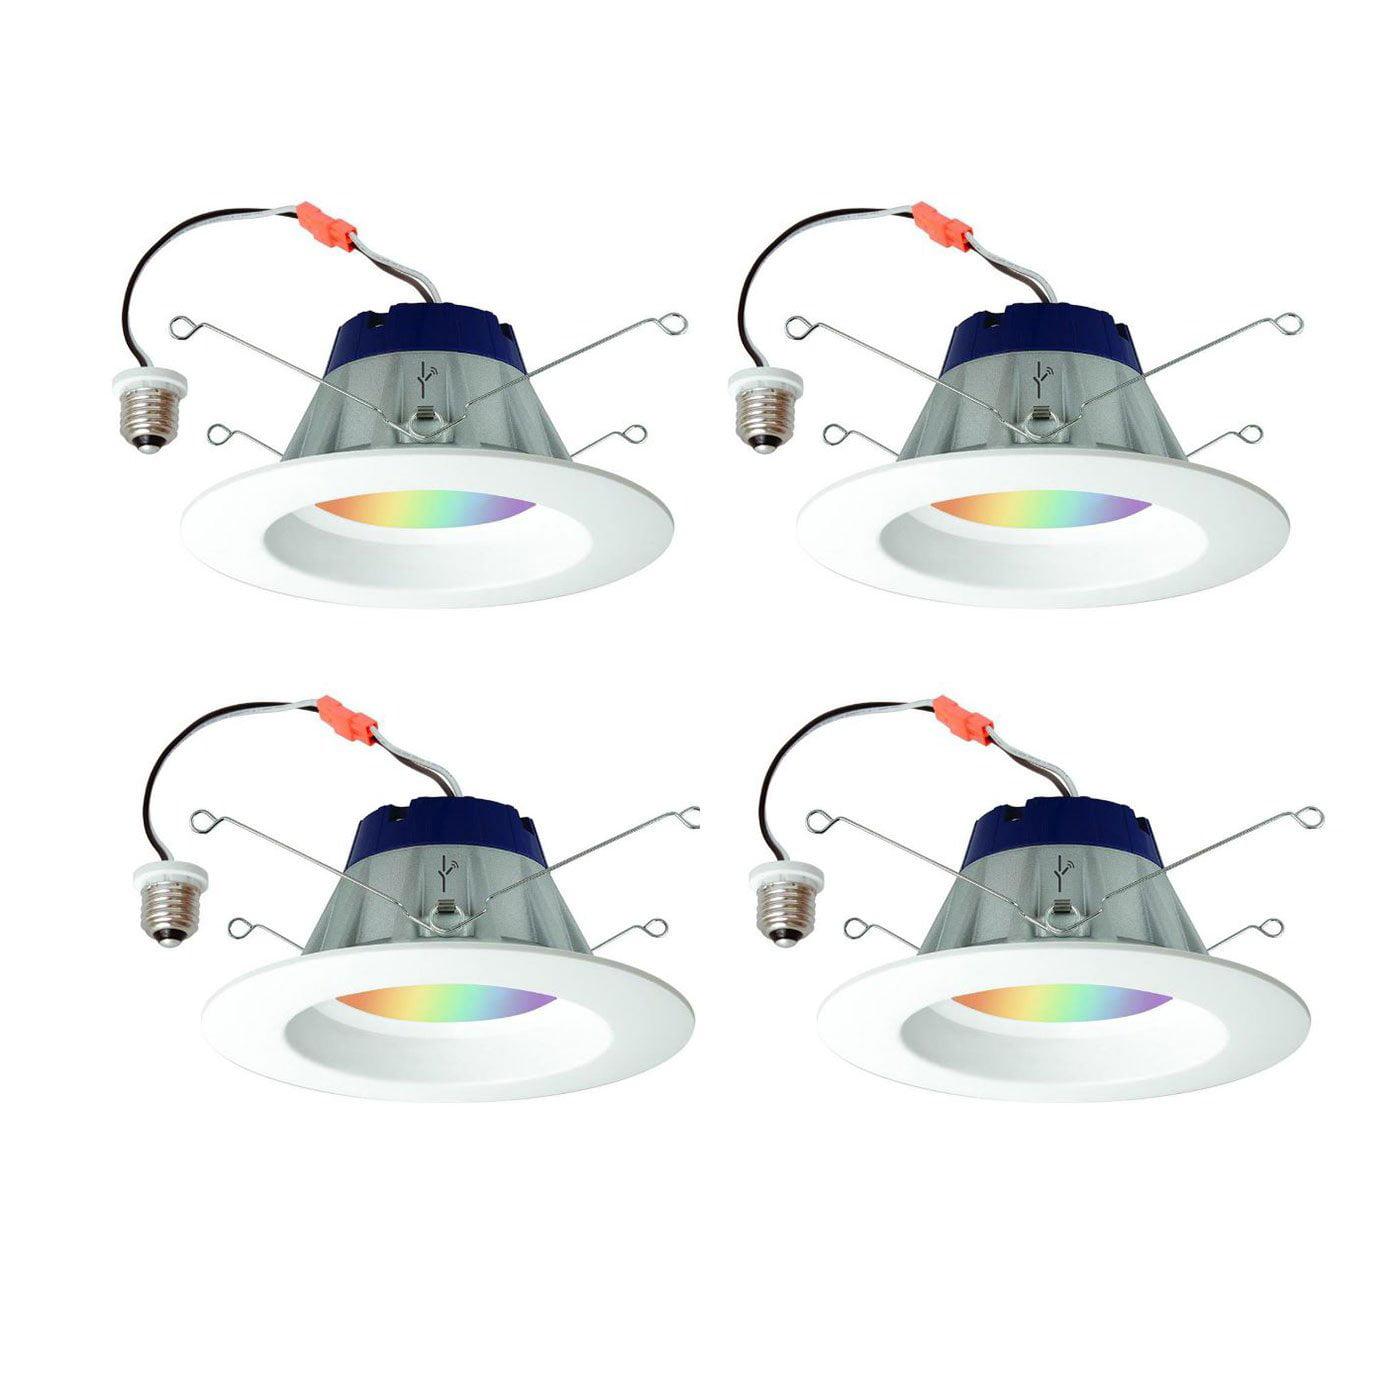 Sylvania Lightify 65W LED Smart Home Wifi Daylight White Light Bulb (4 Bulbs)